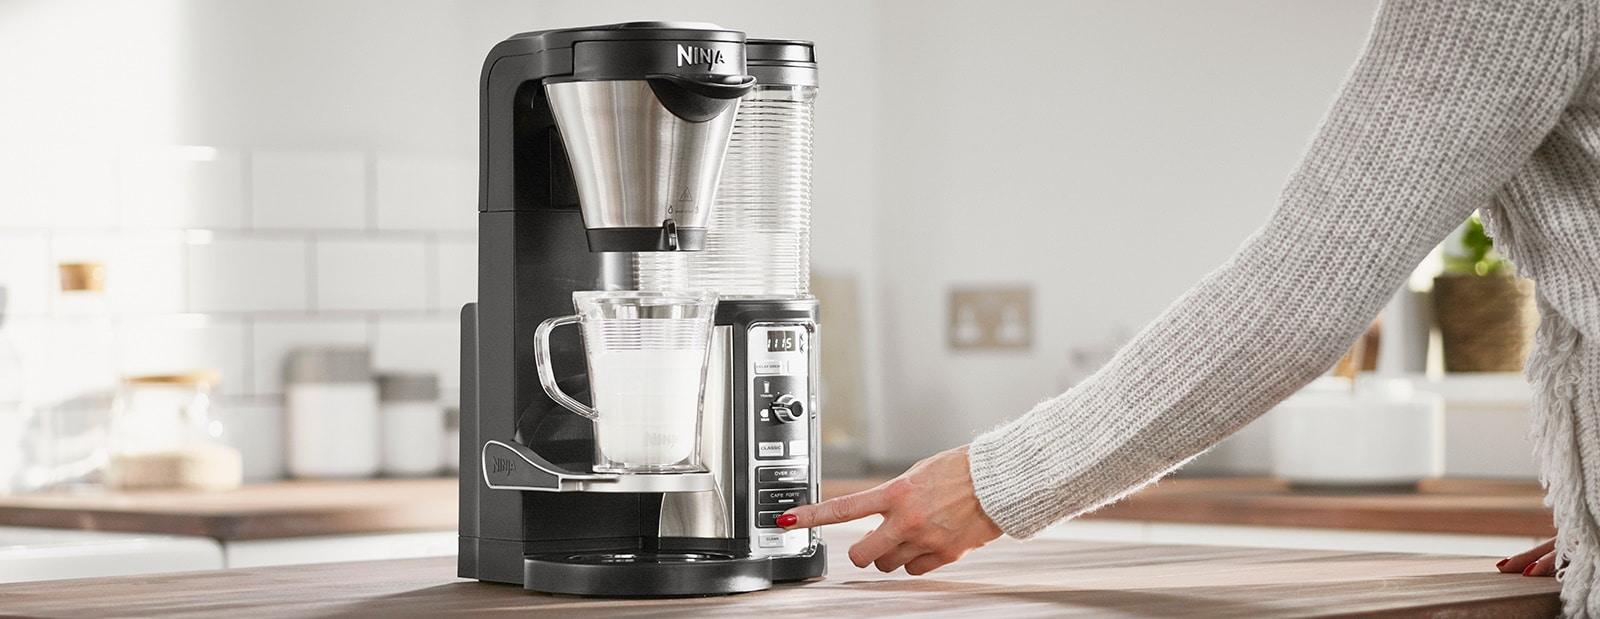 Best Smart Coffee Makers [Jun. 2020] – Detailed Reviews